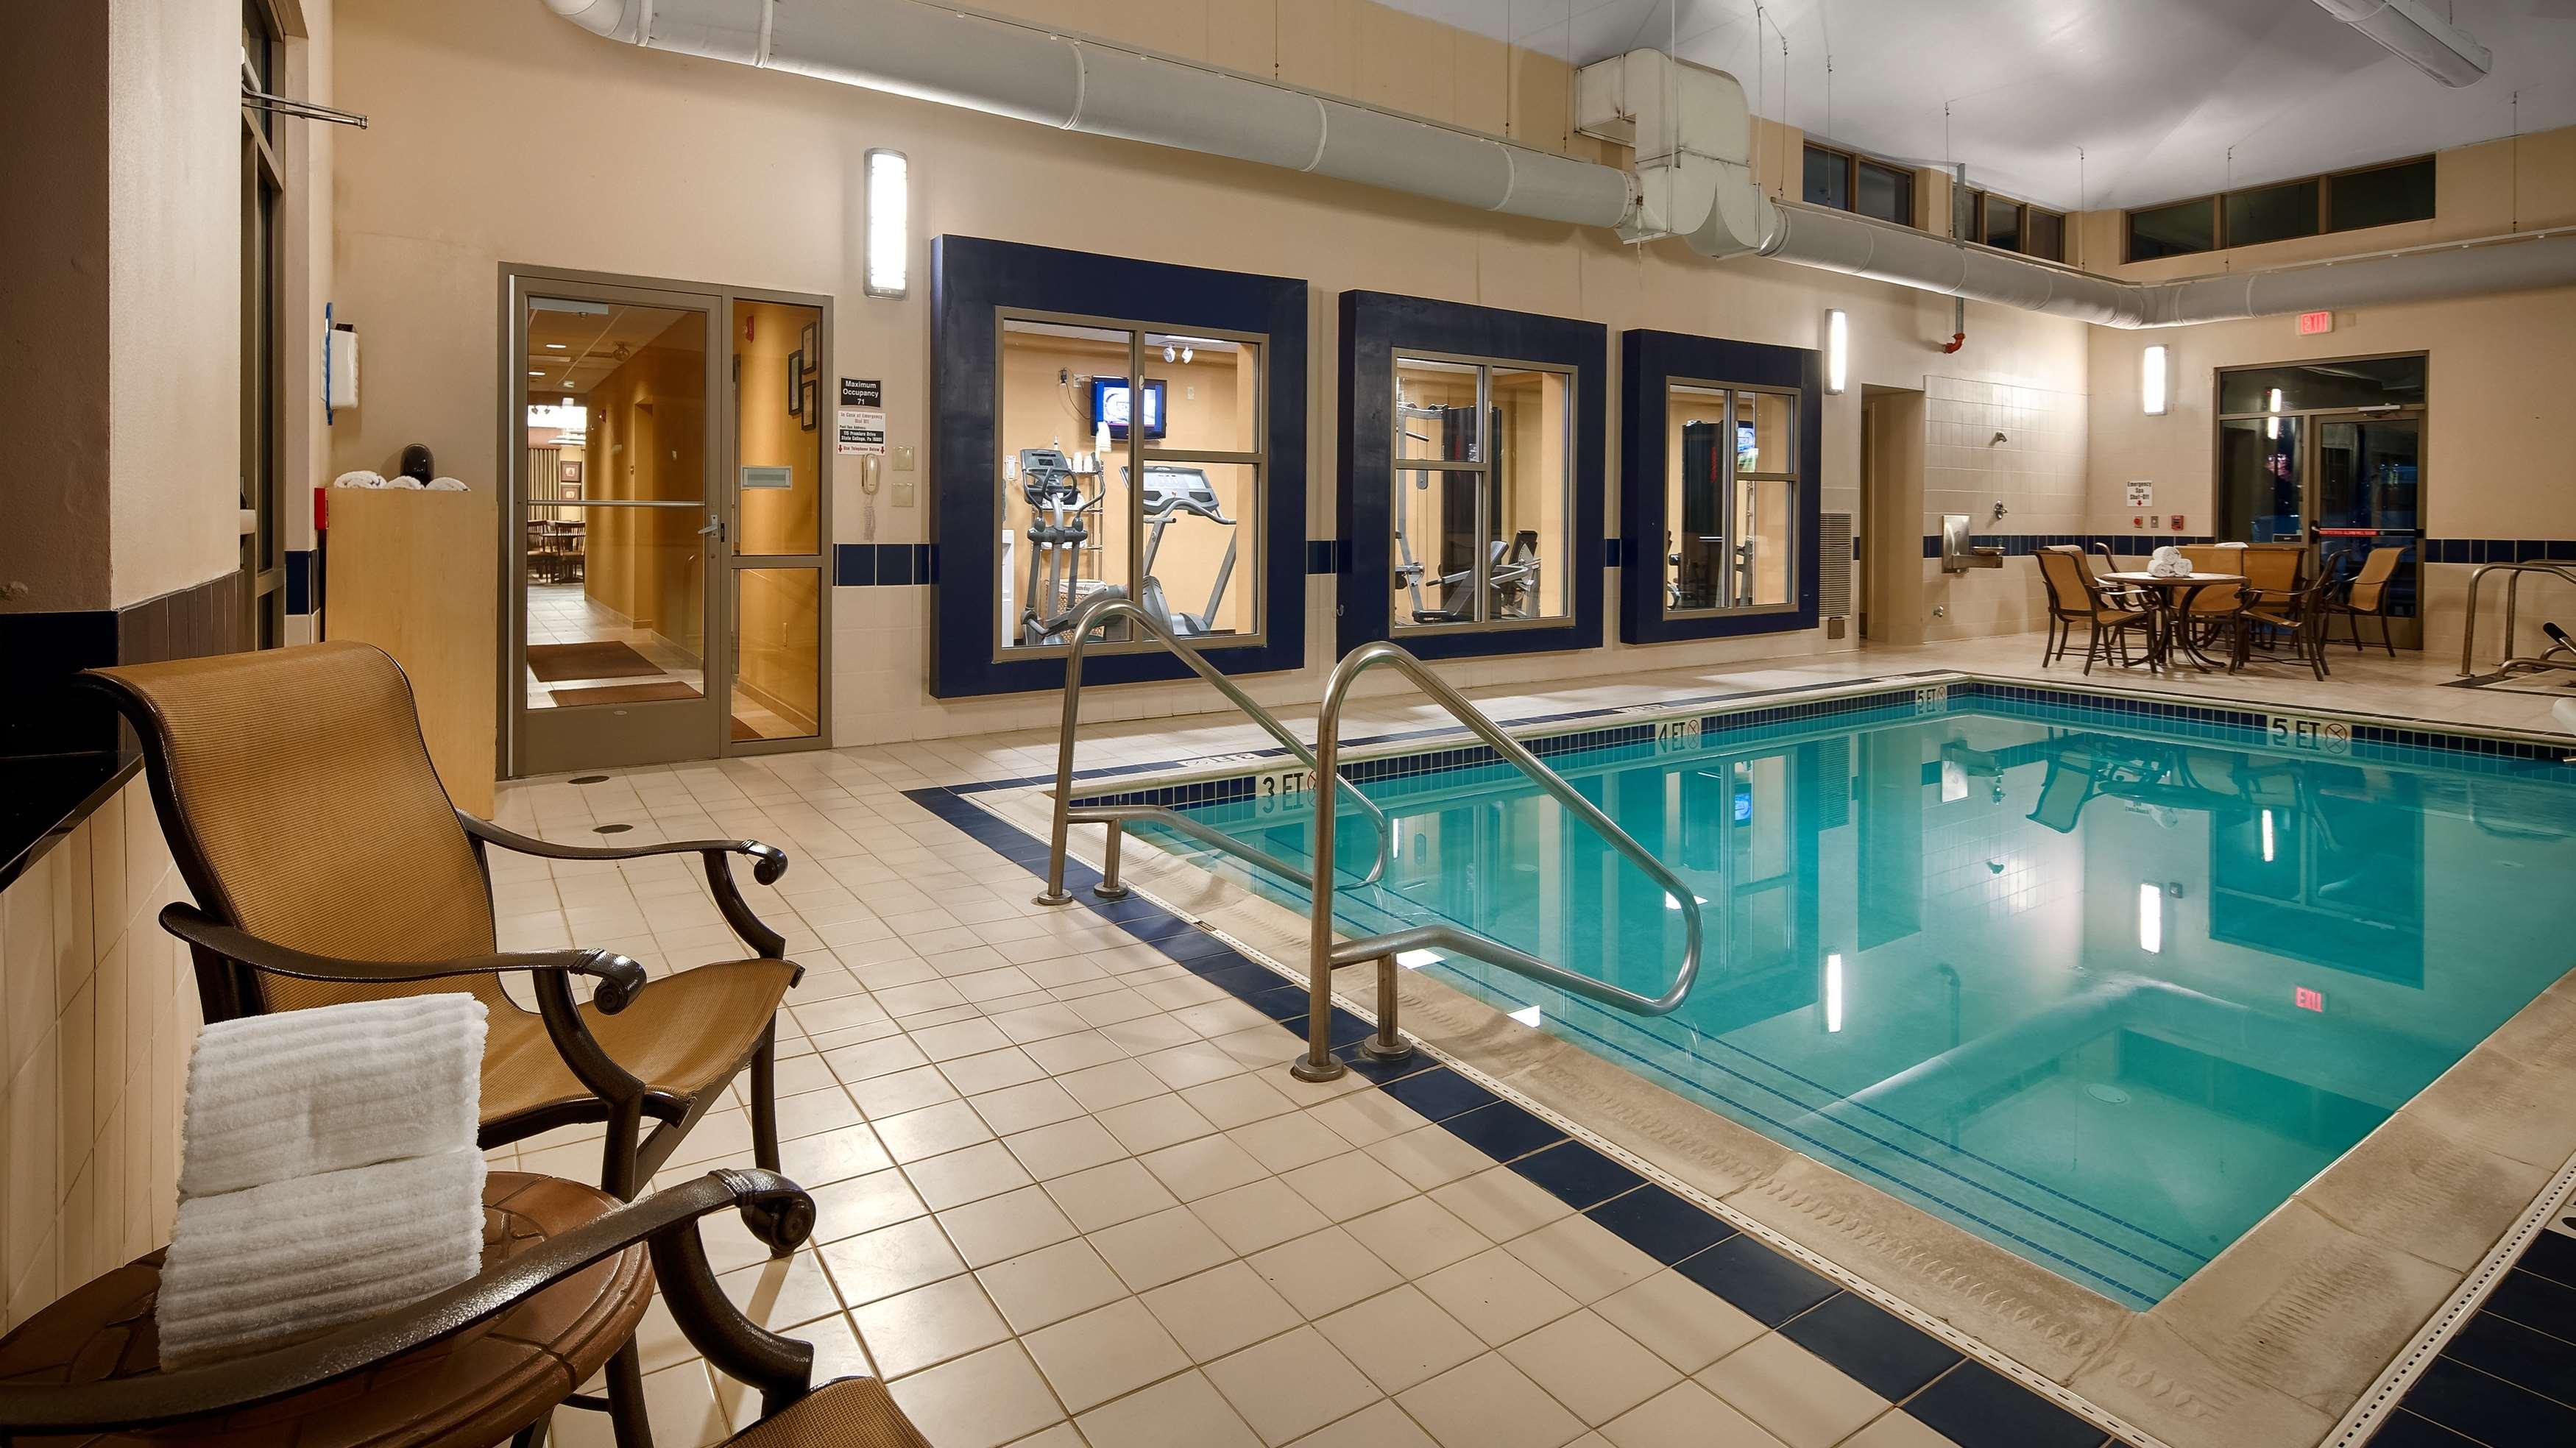 Best Western Plus University Park Inn & Suites image 2